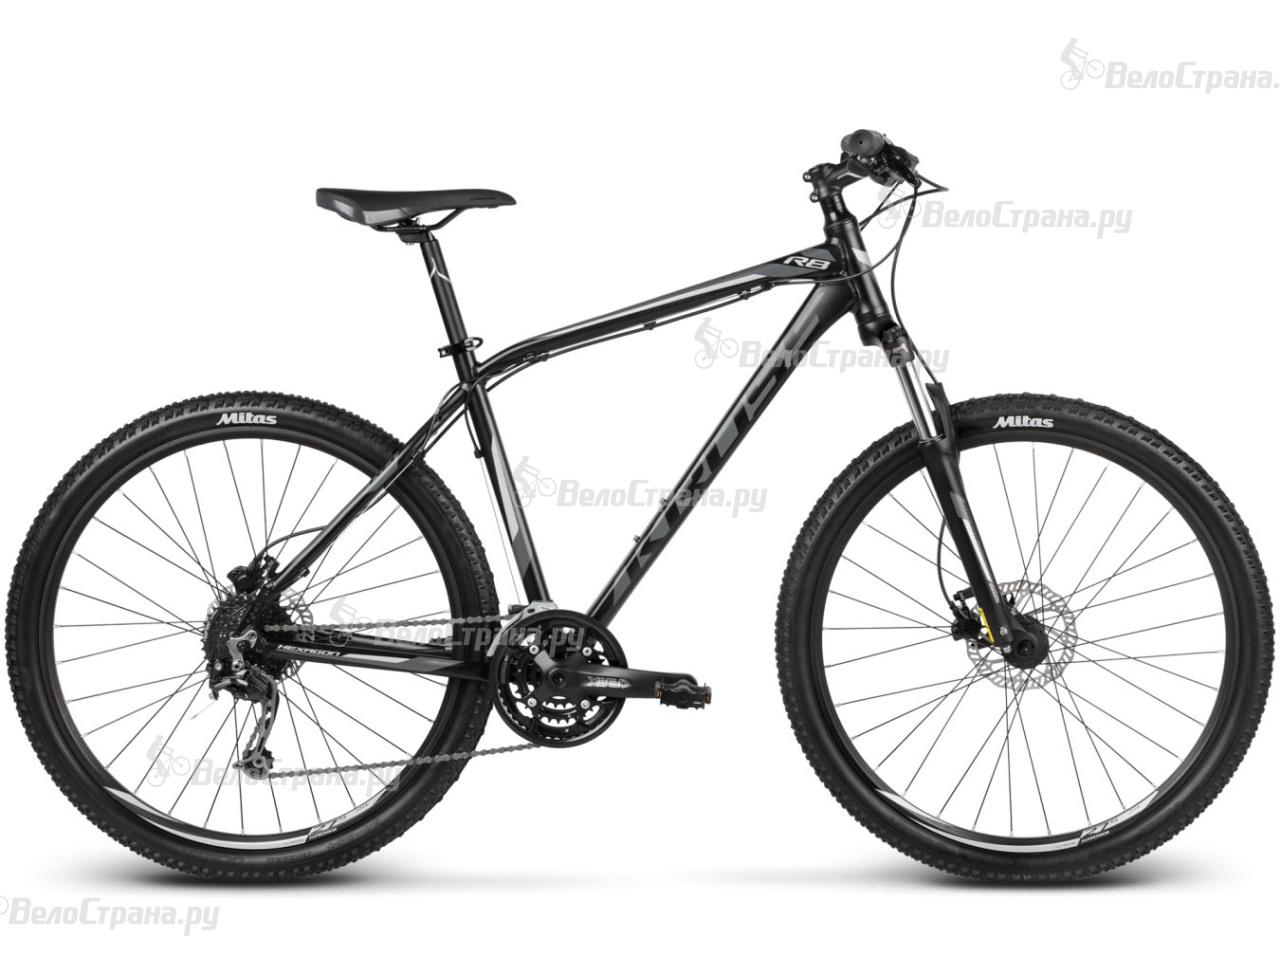 Велосипед Kross Hexagon R8 (2017) велосипед kross hexagon mini 2015